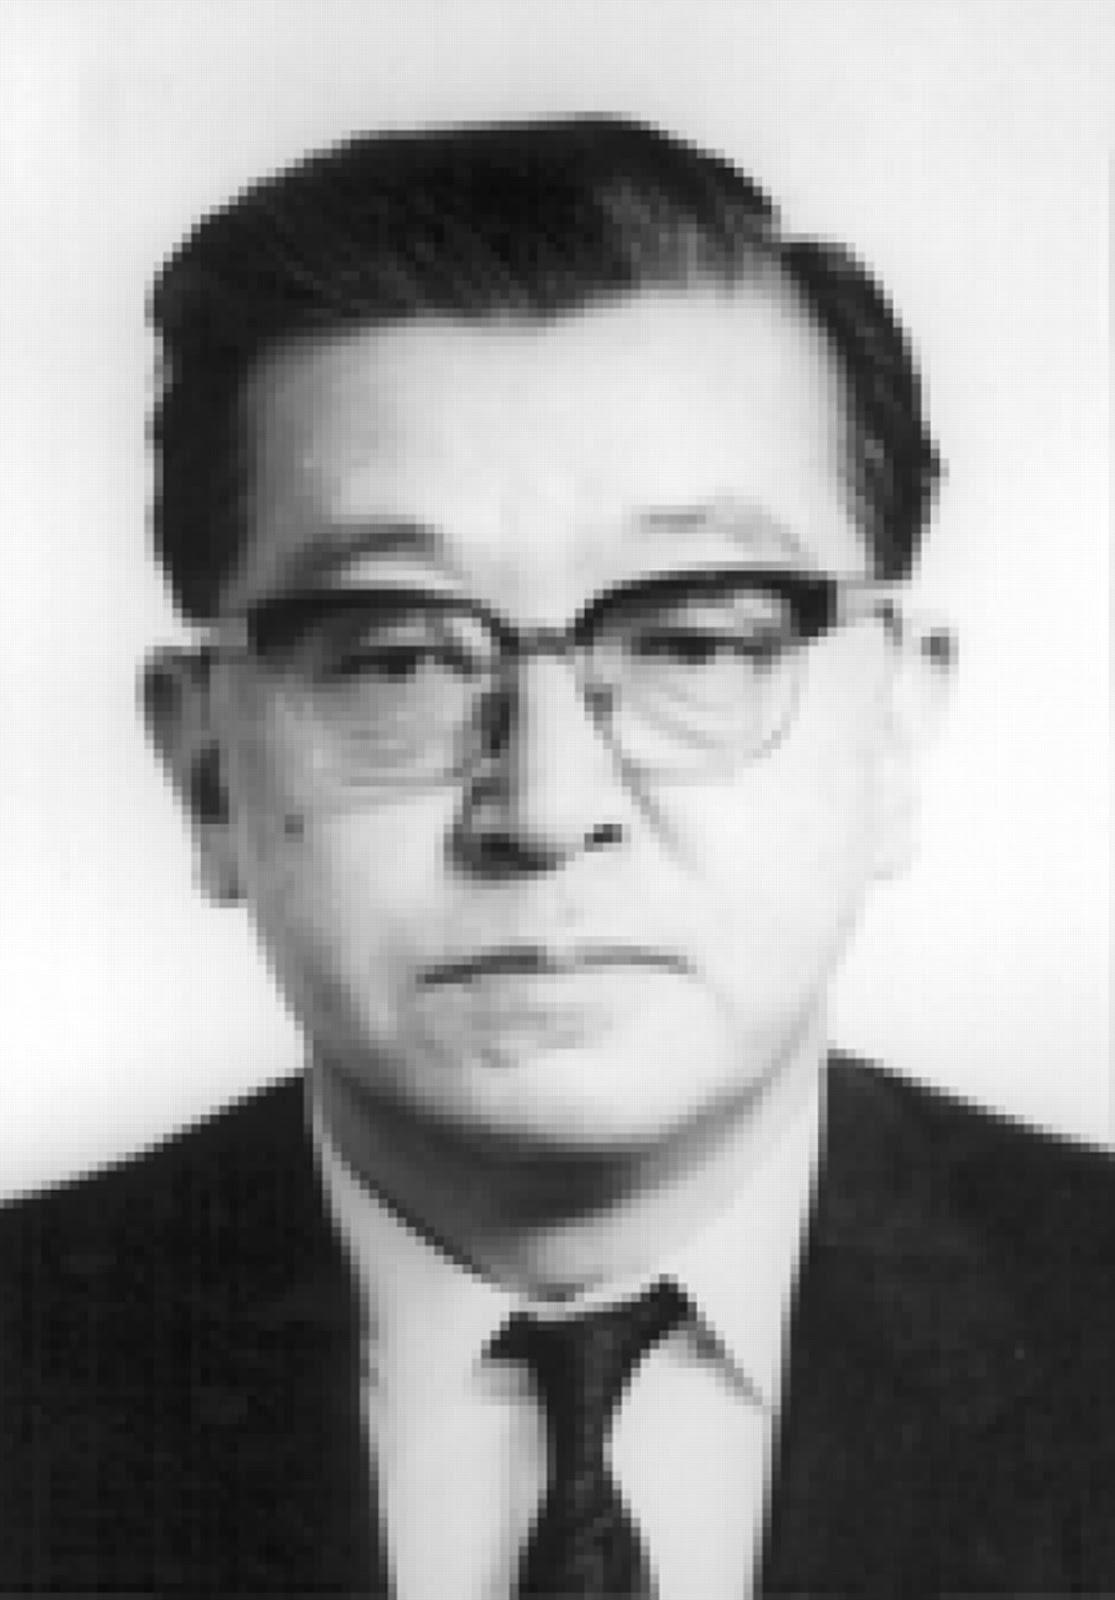 kaoru ishikawa Mr kaoru ishikawa has been an external audit & supervisory board member of shimizu corporation since july 6, 2016.